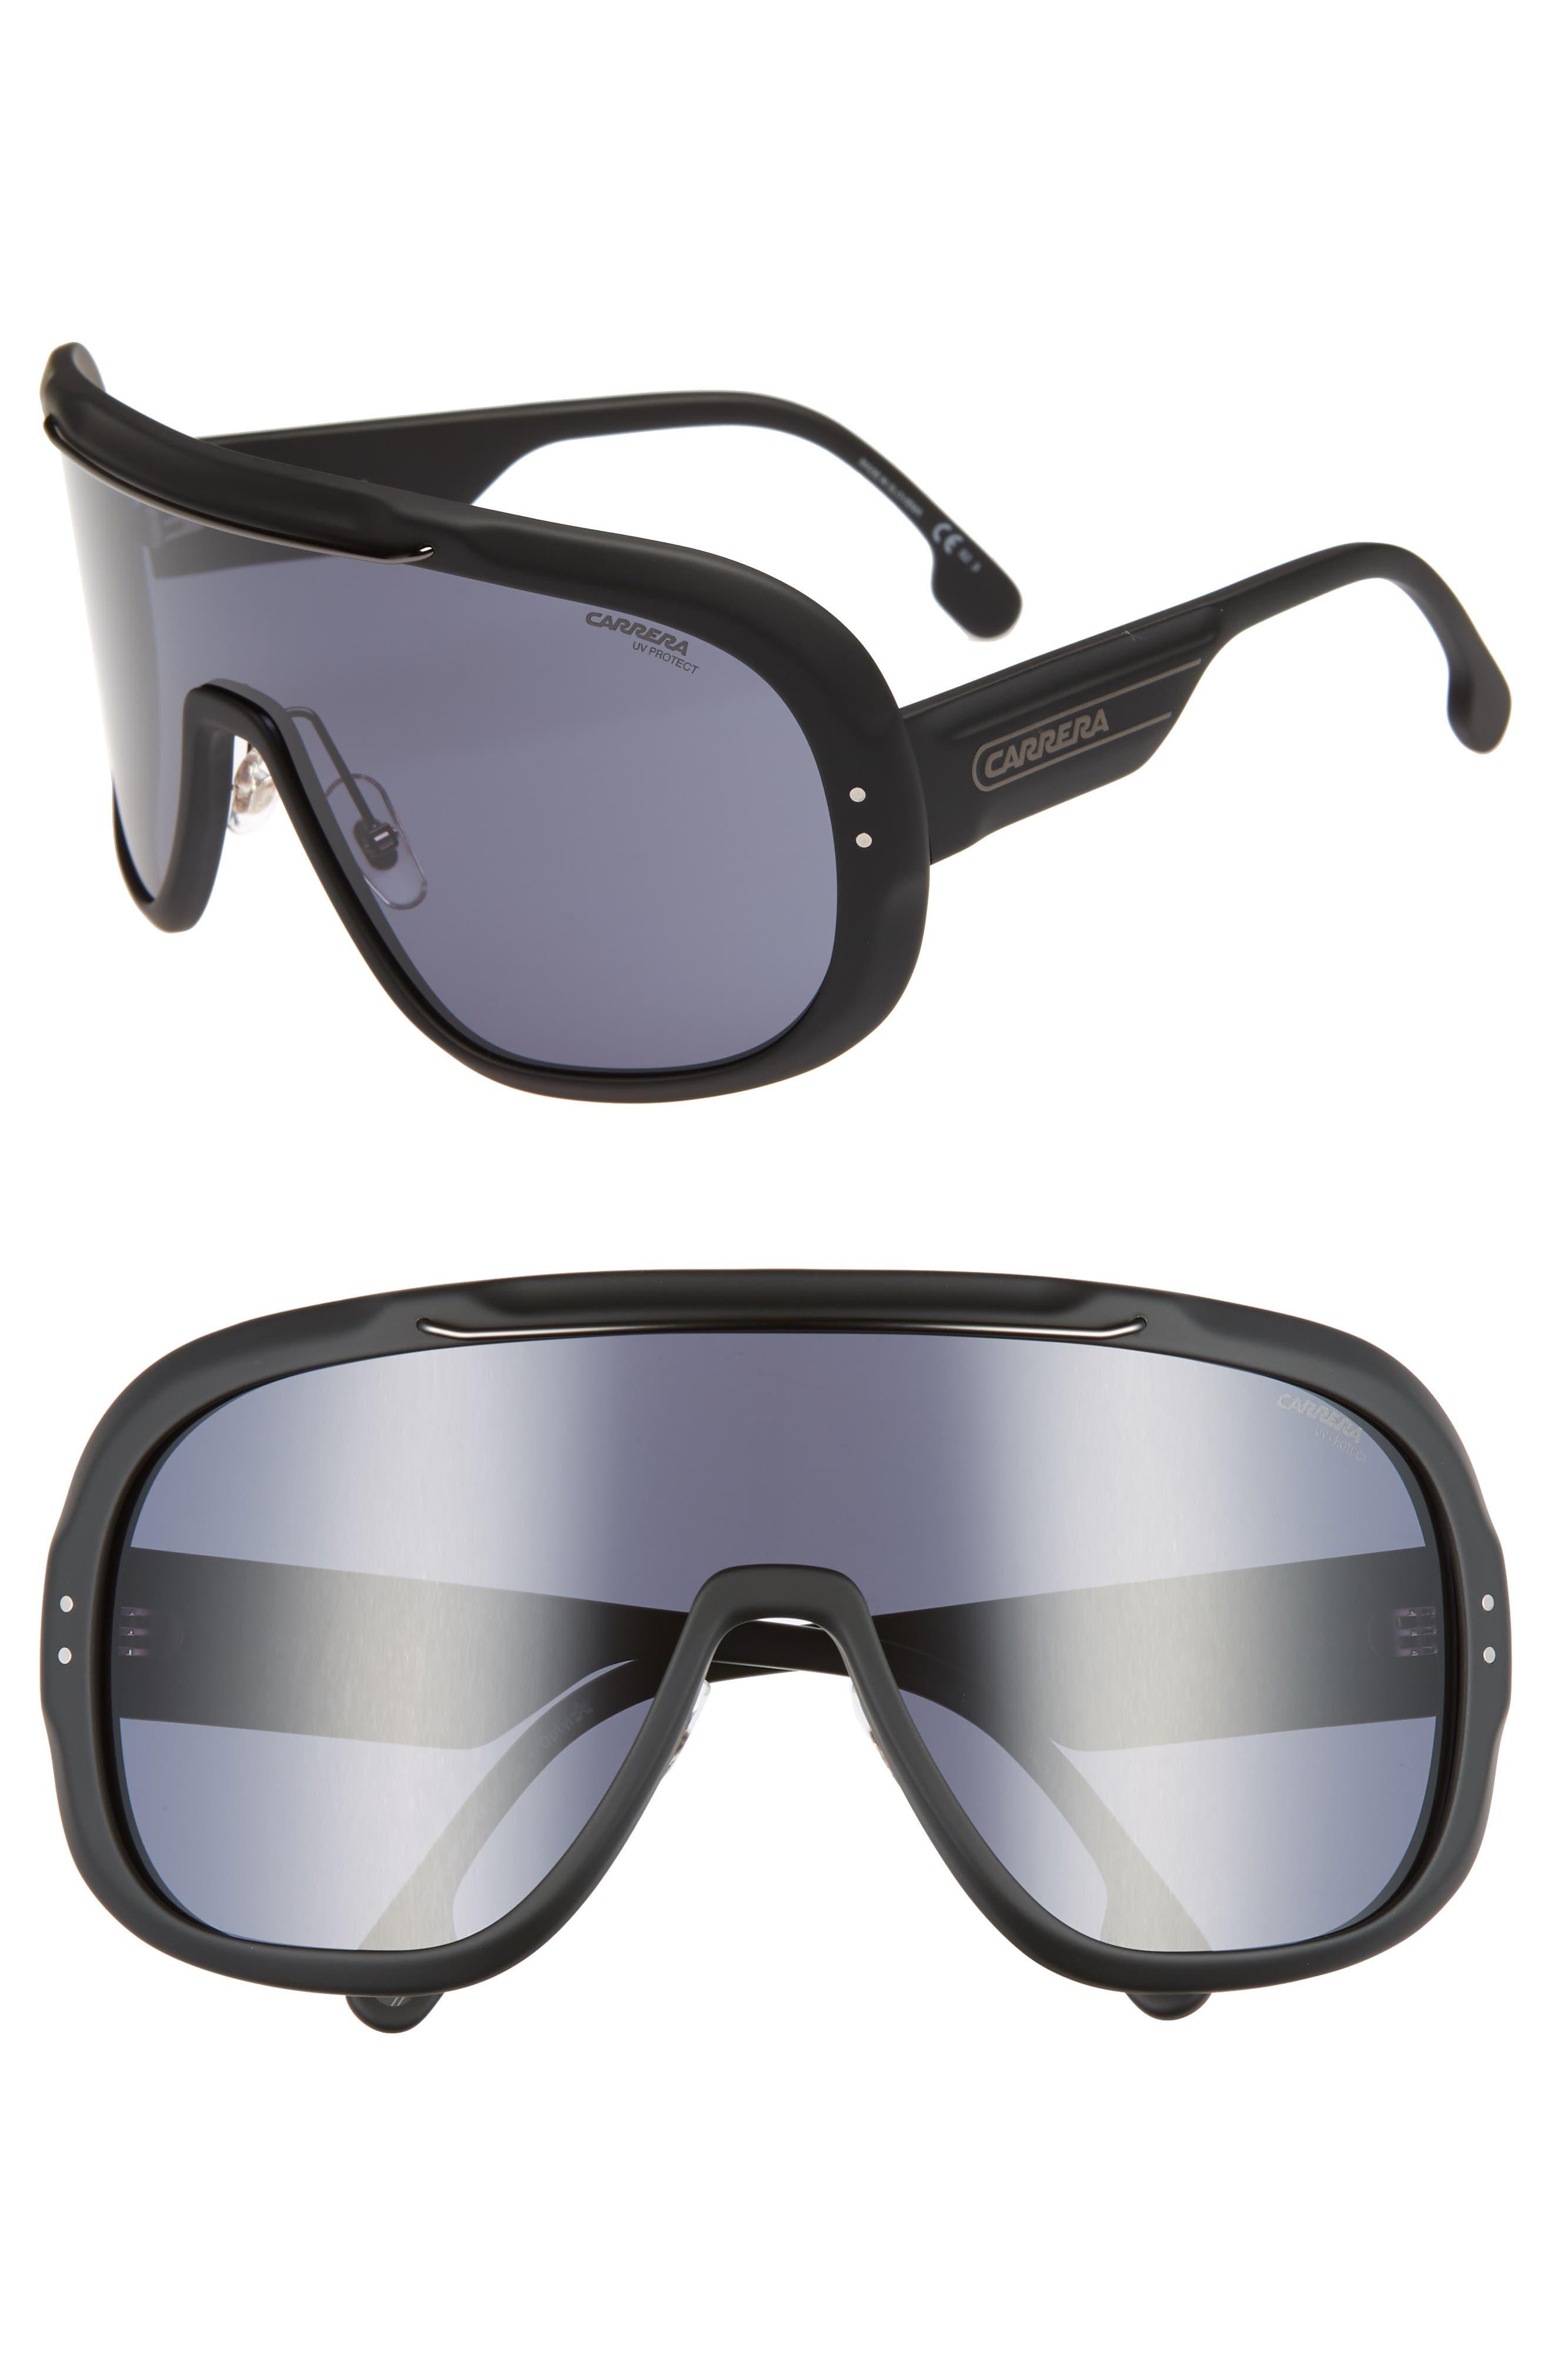 Carrera Eyewear Epica 9m Shield Sunglasses -